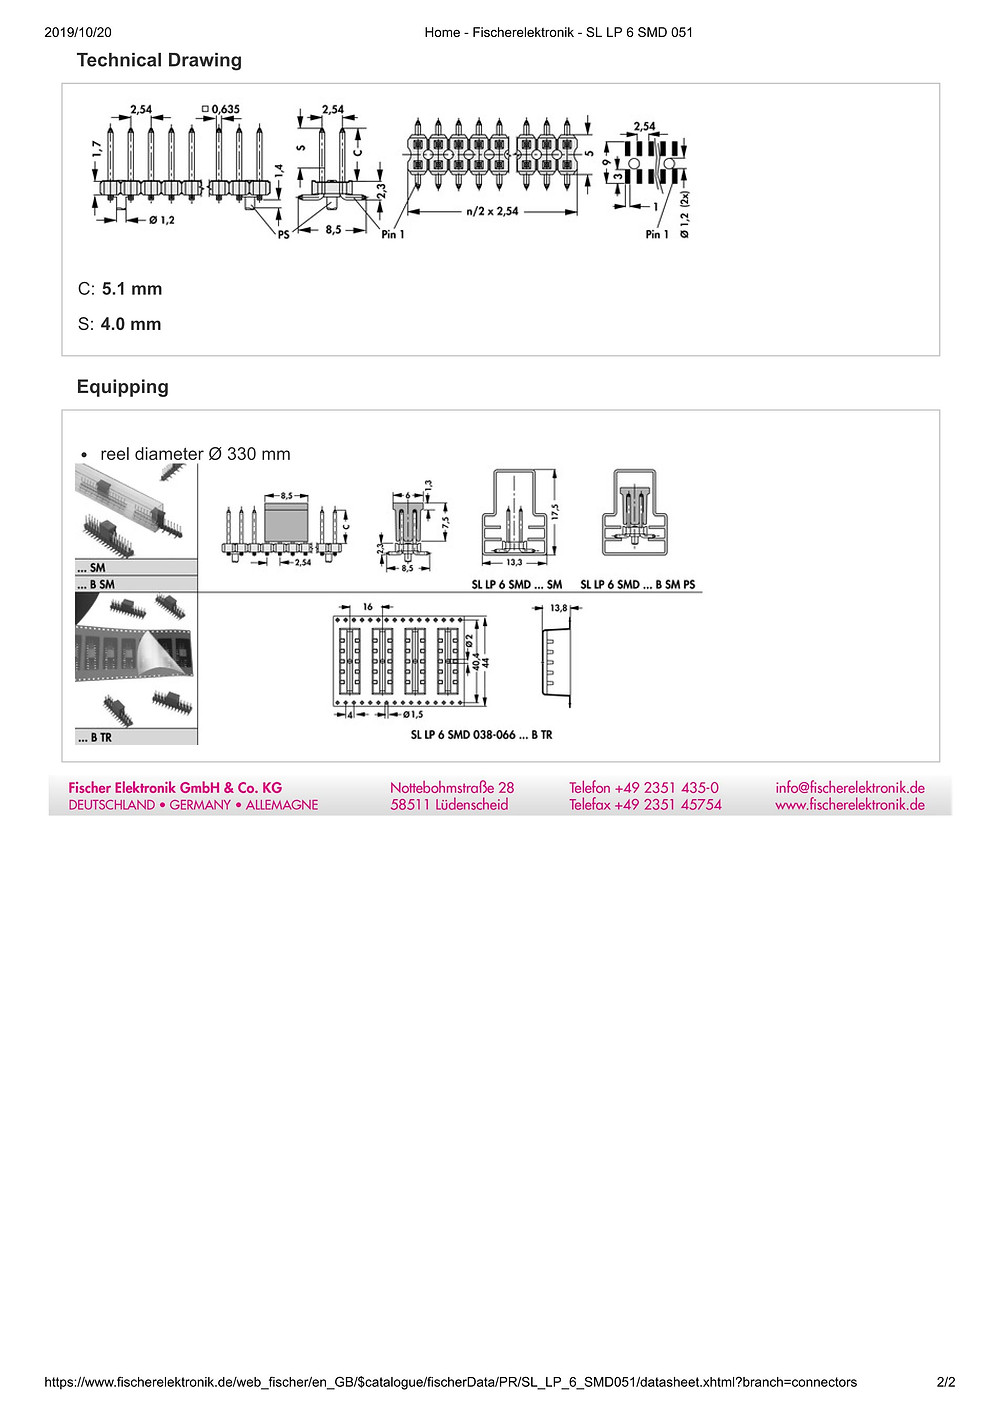 SL LP 6 SMD 051 フィッシャー テープ&リール対応 低背型 ピンヘッダ 2列 2.54㎜ピッチ □0.635mm (1リール=250個巻)4-40ピン